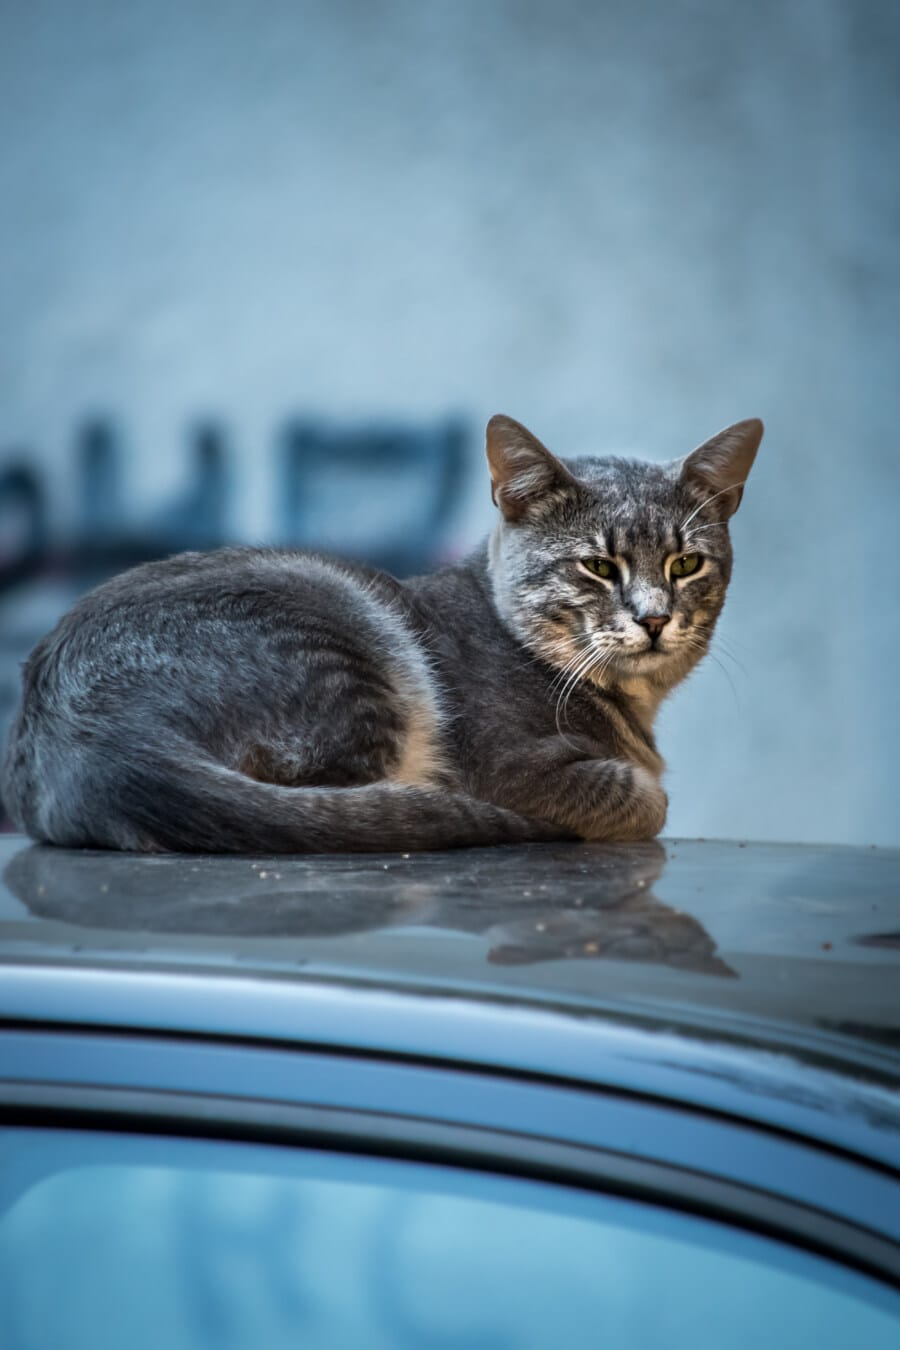 domestic cat, tabby cat, grey, laying on, car, kitty, pet, cute, cat, eye